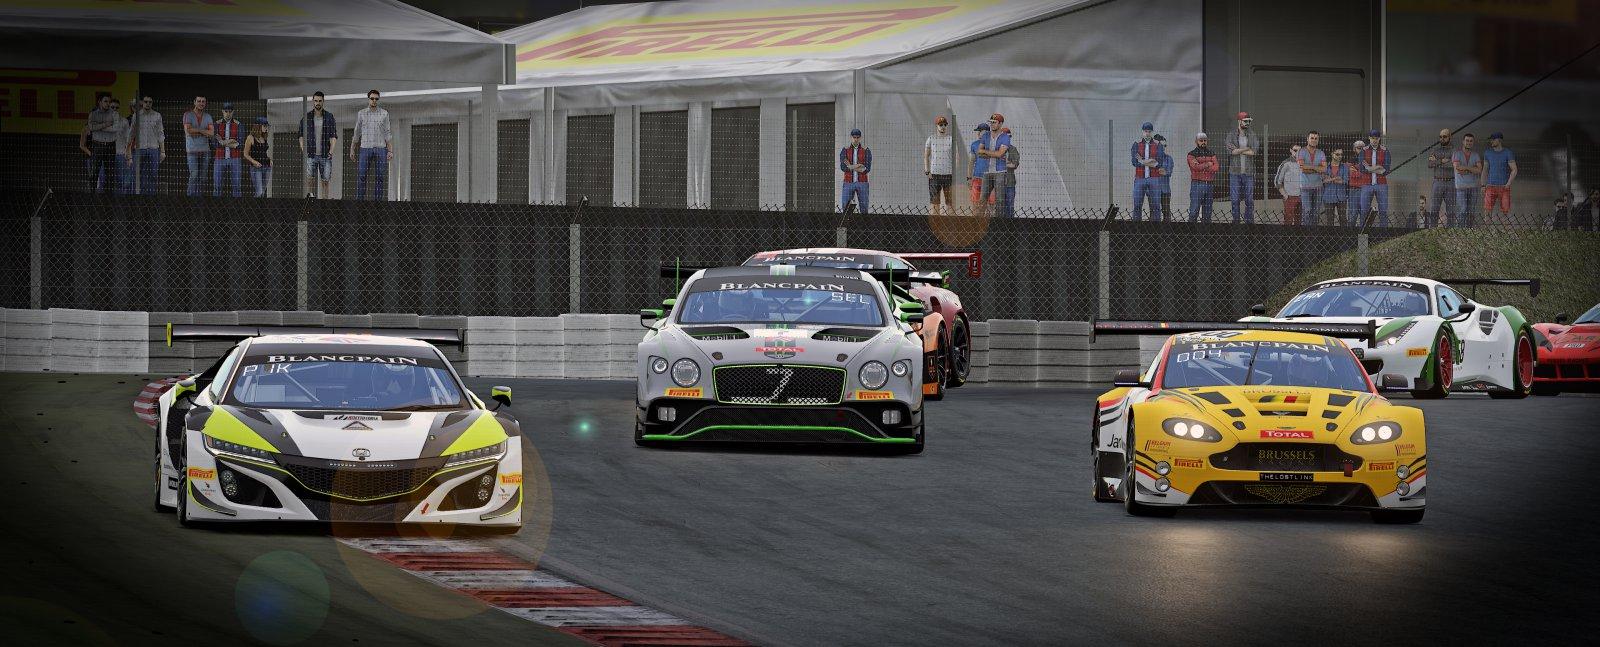 Assetto Corsa Competizione Screenshot 2019.11.19 - 13.07.50.69.jpg